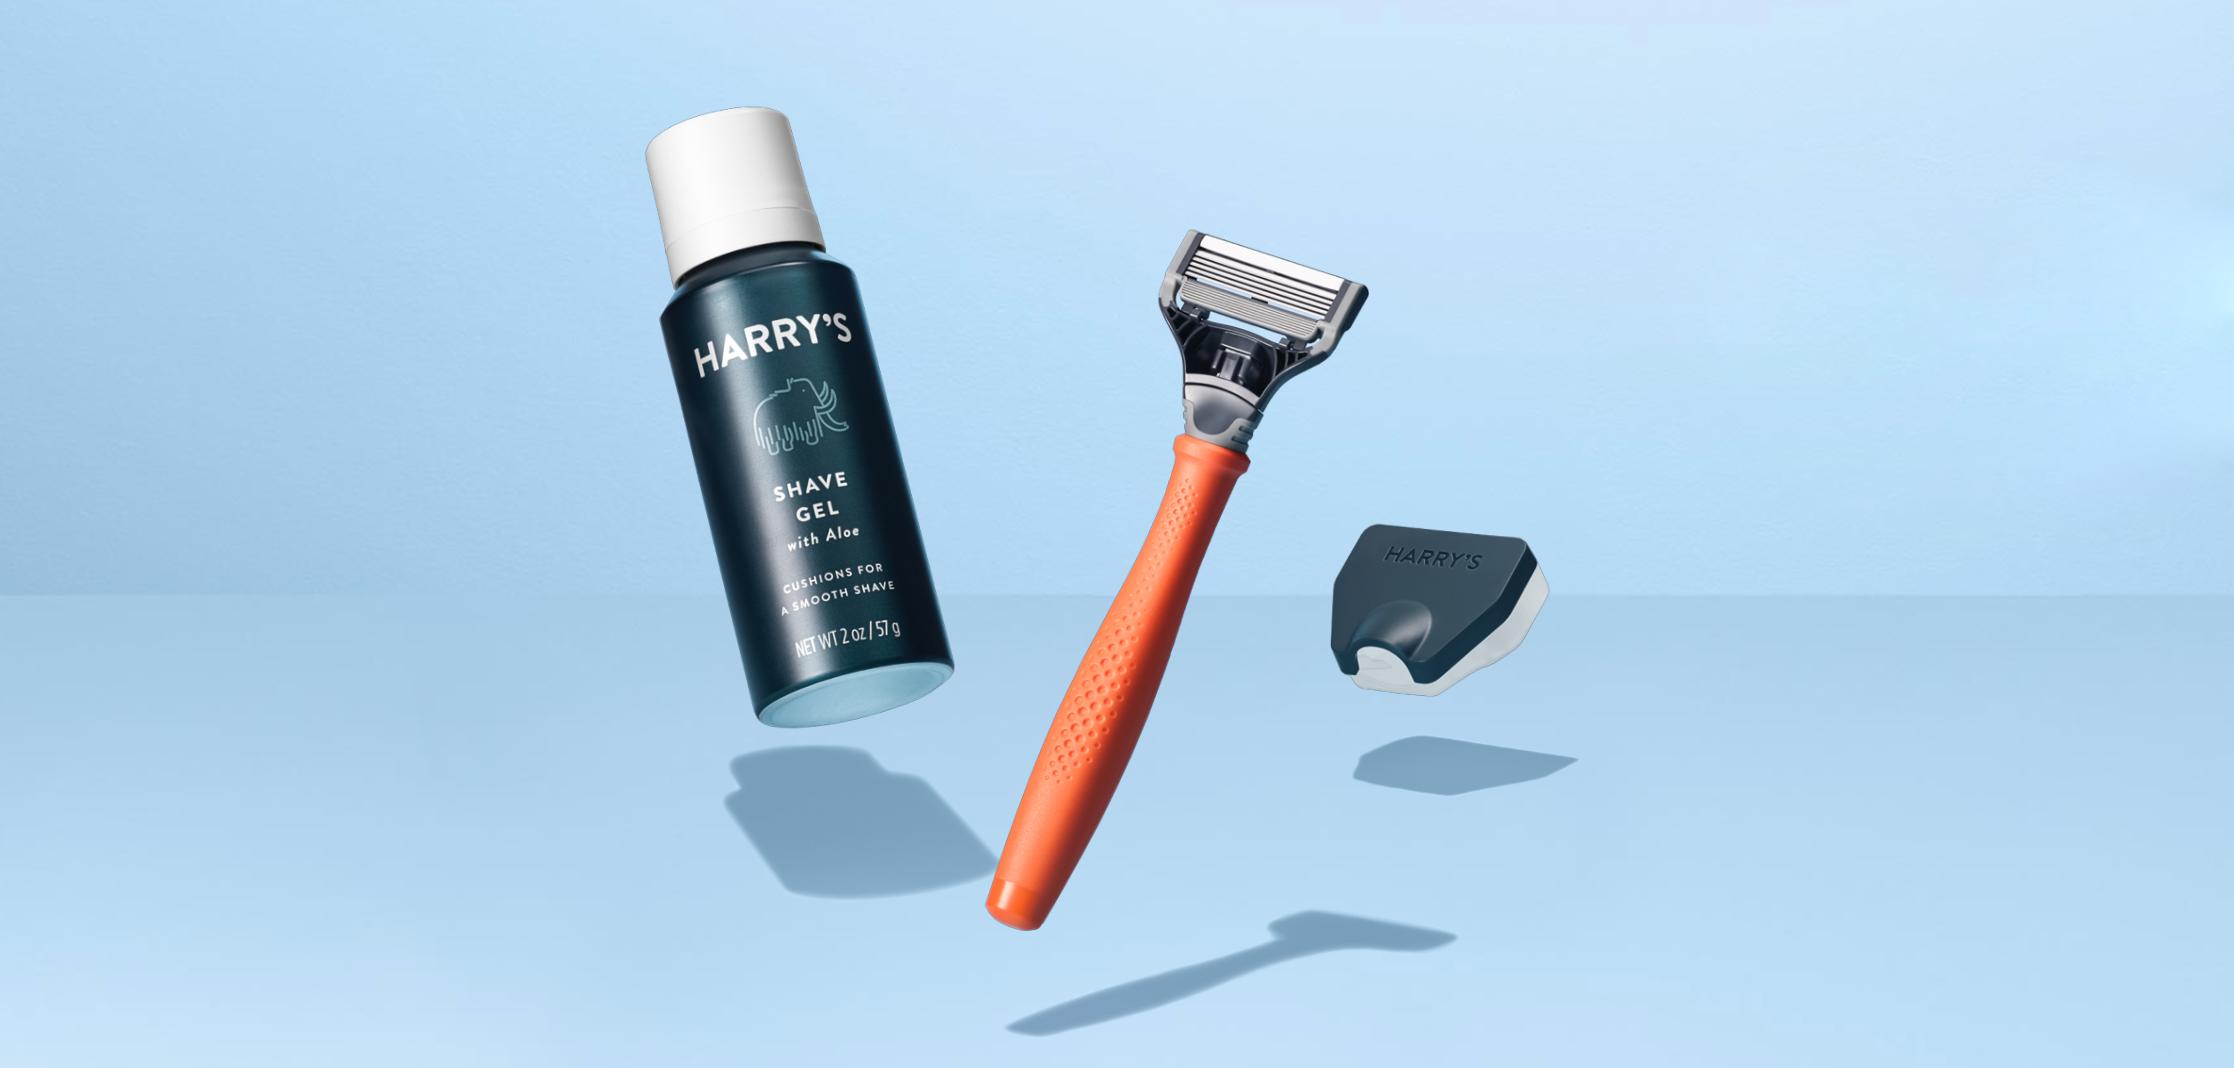 Harrys-shave-kit